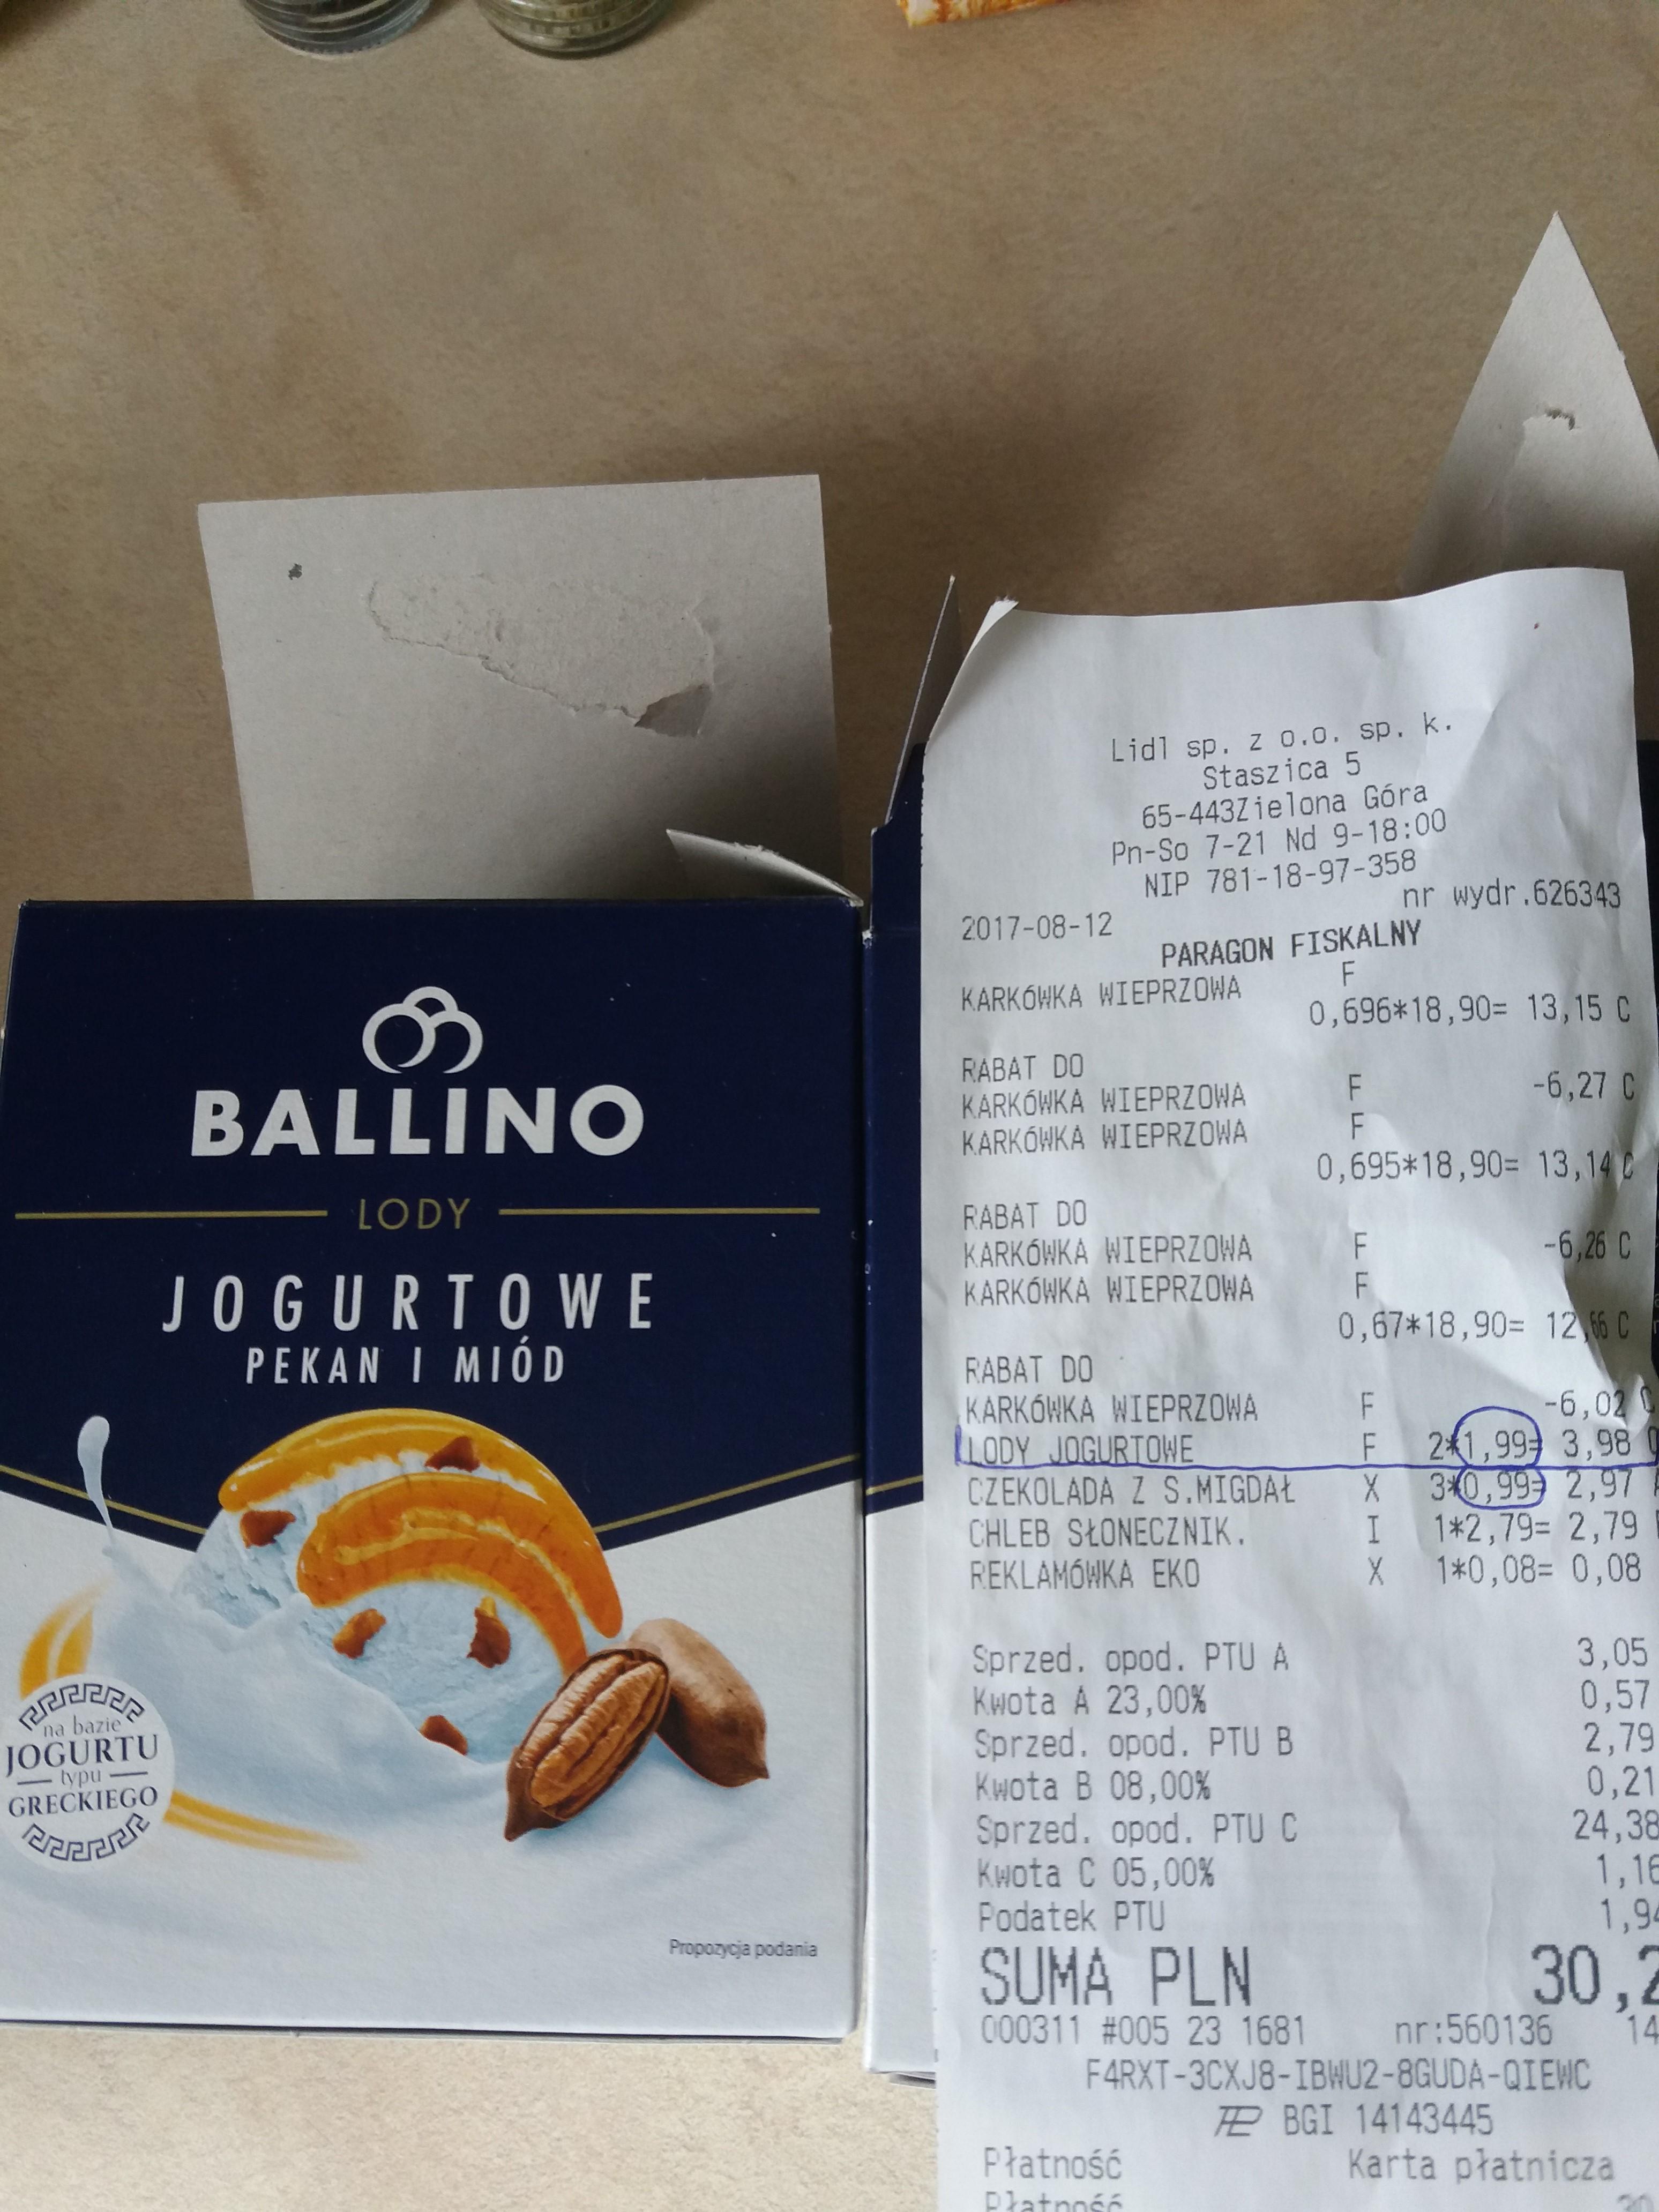 LIDL - lody Ballino 460ml/300g CENA 1,99